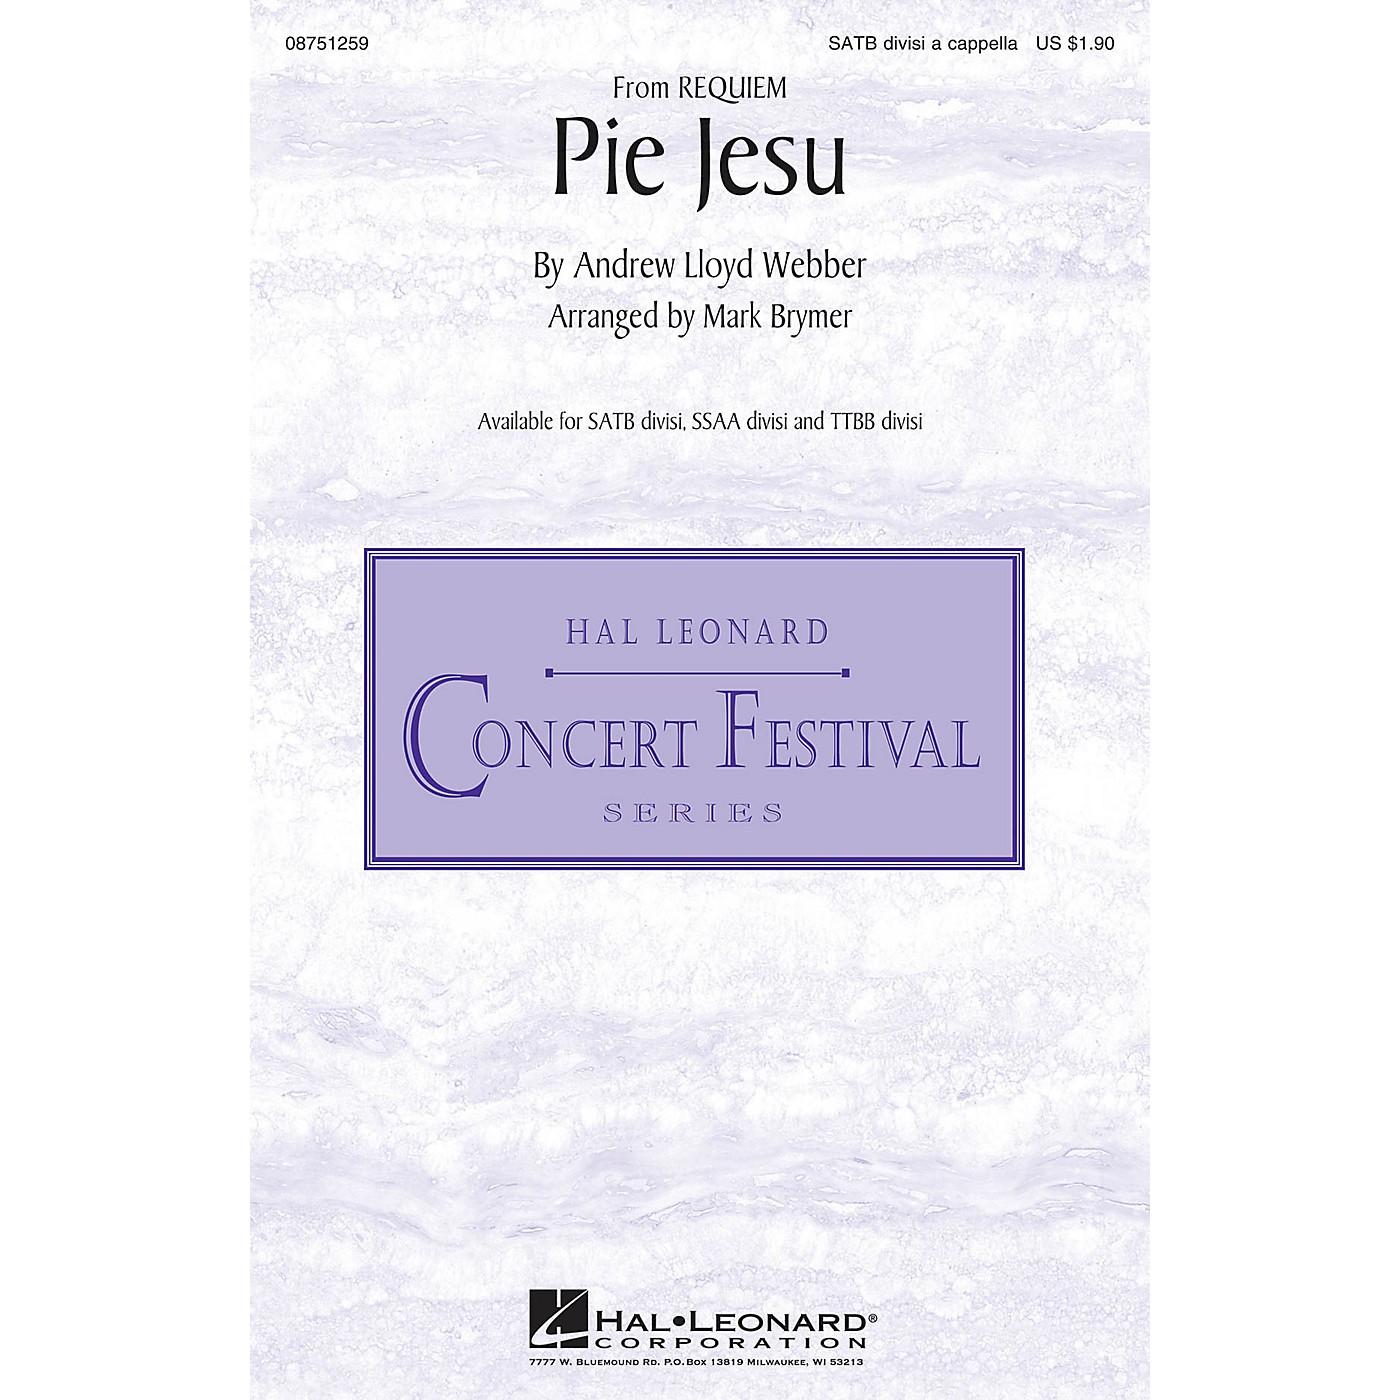 Hal Leonard Pie Jesu (from Requiem) SATB DV A Cappella arranged by Mark Brymer thumbnail